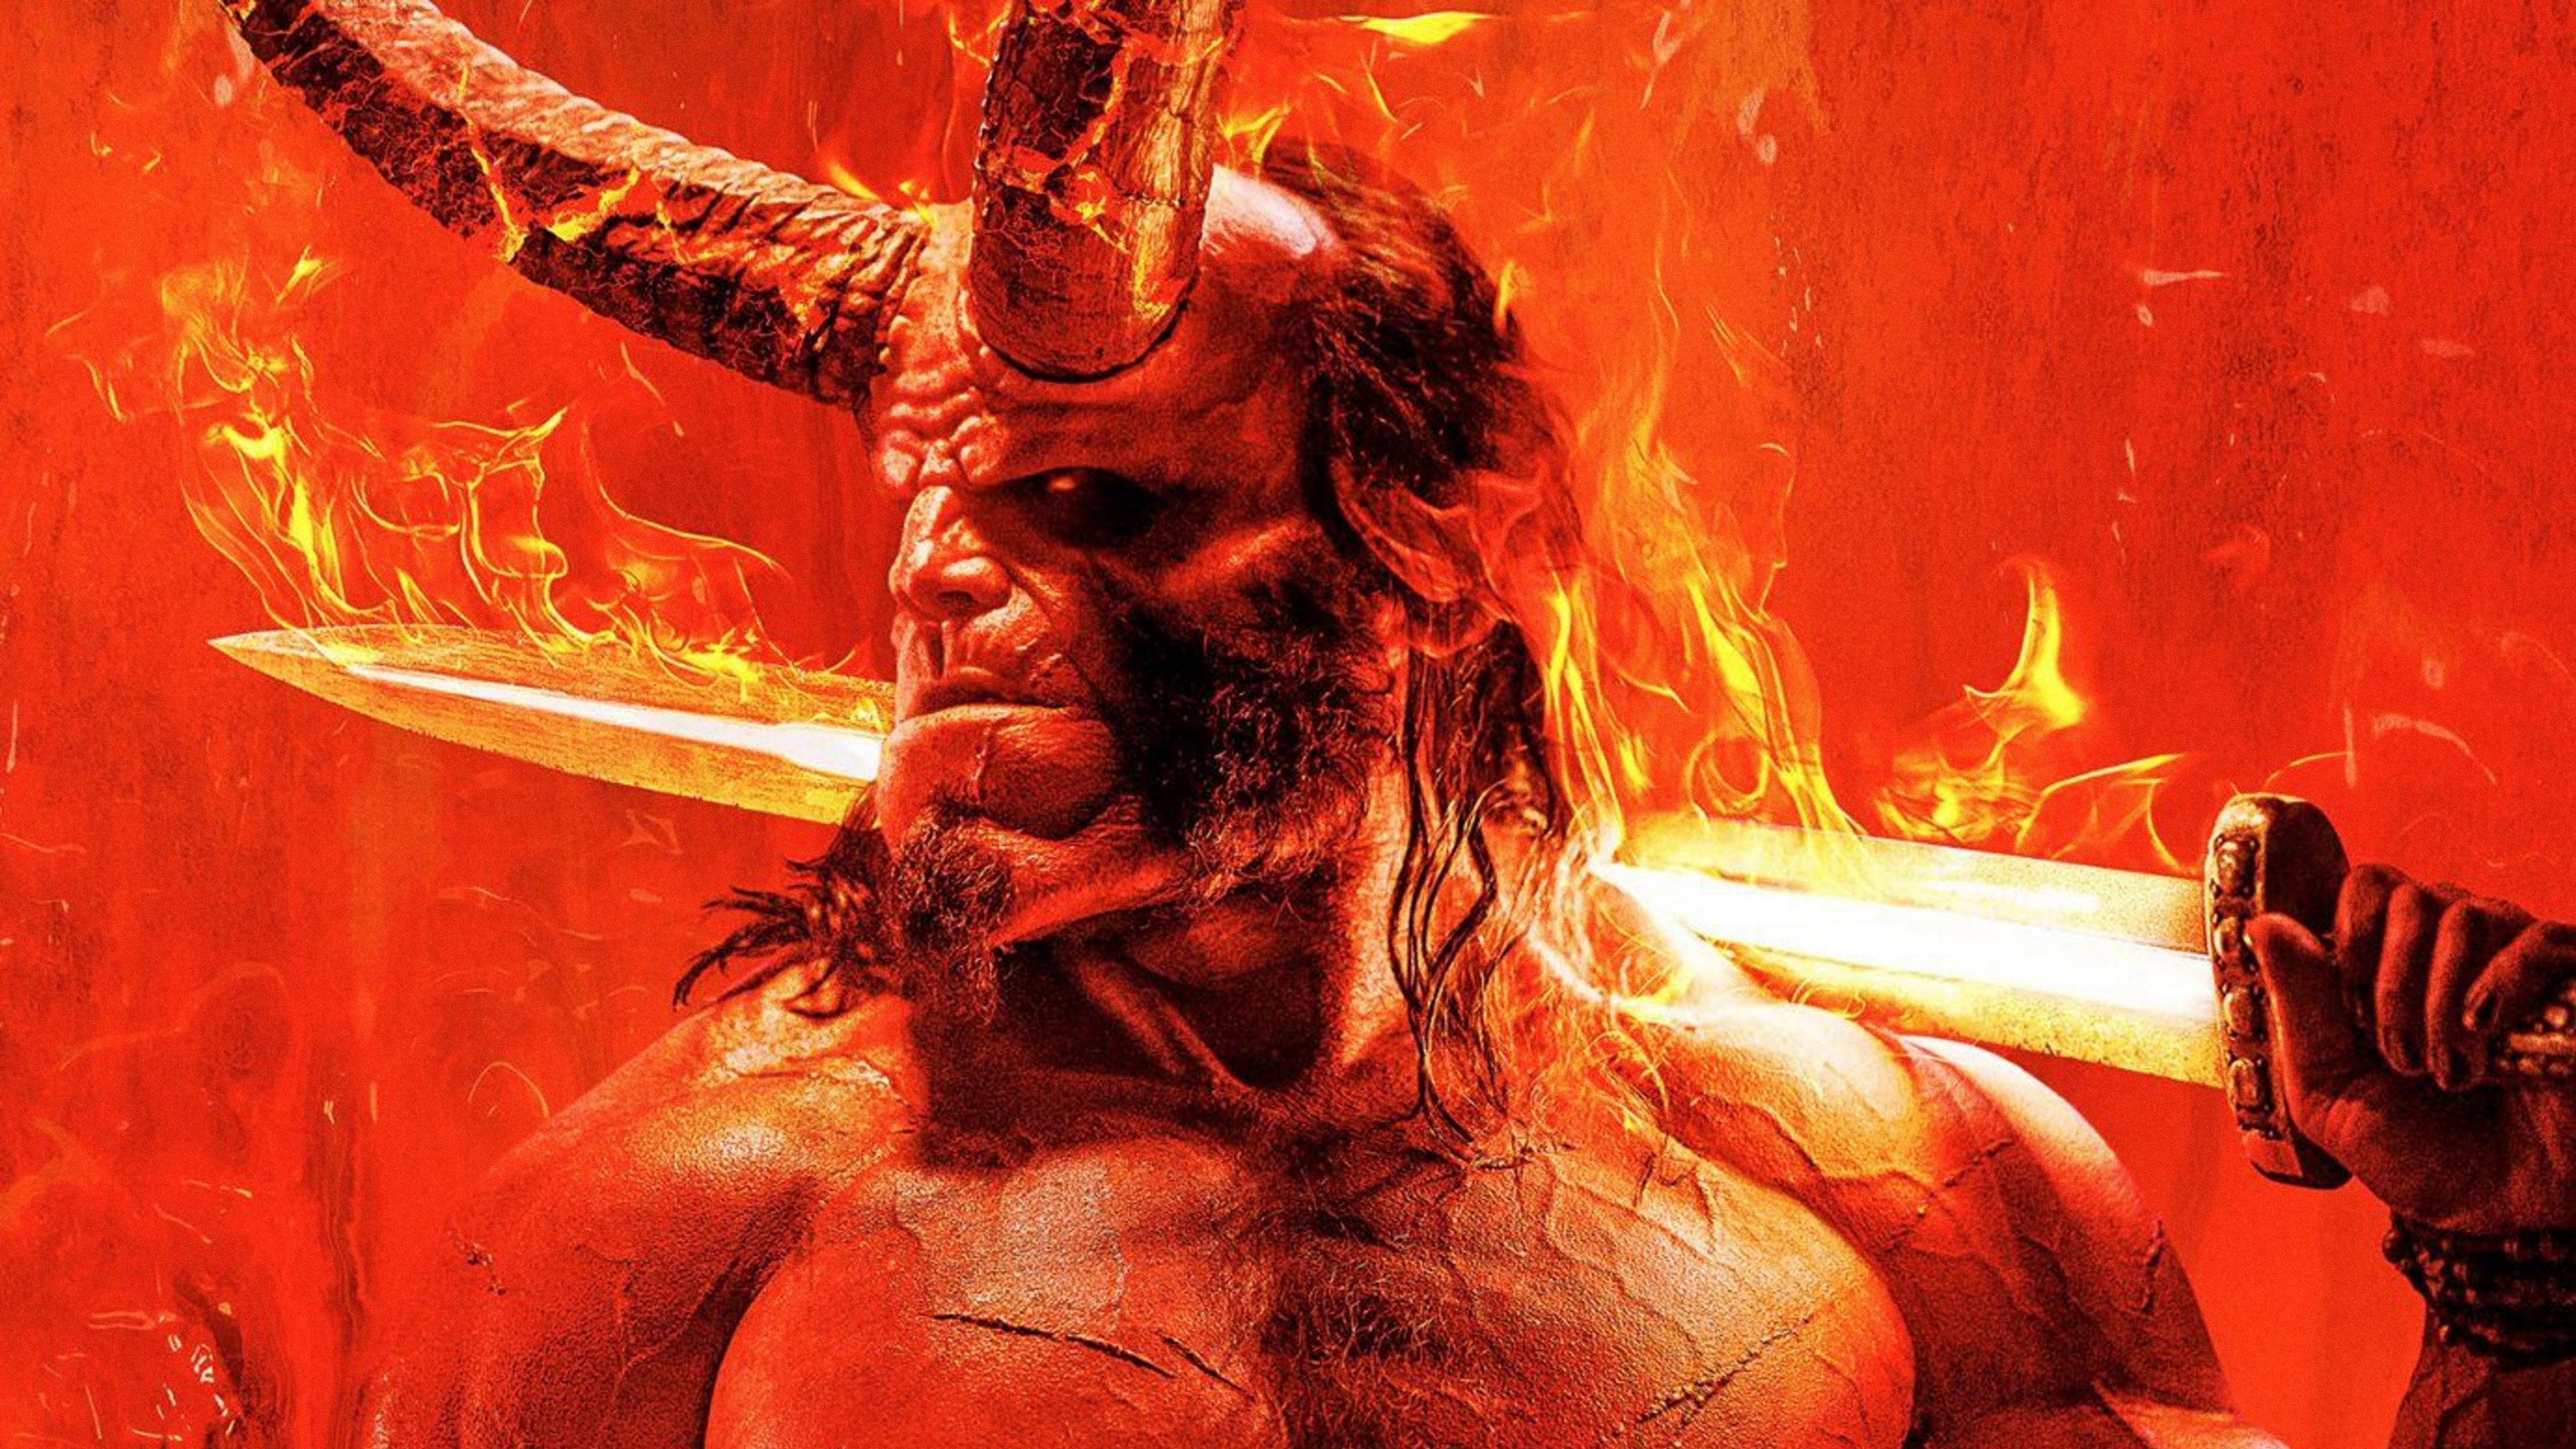 hellboy movie 2019 poster 1l 3840x2160 - Hellboy Movie 2019 Art 4k - hellboy wallpapers hd 4k new, Hellboy hd wallpapers, hellboy hd 4k wallpapers, hellboy art hd 4k wallpapers, hellboy art hd 4k, hellboy 2019 wallpapers hd 4k